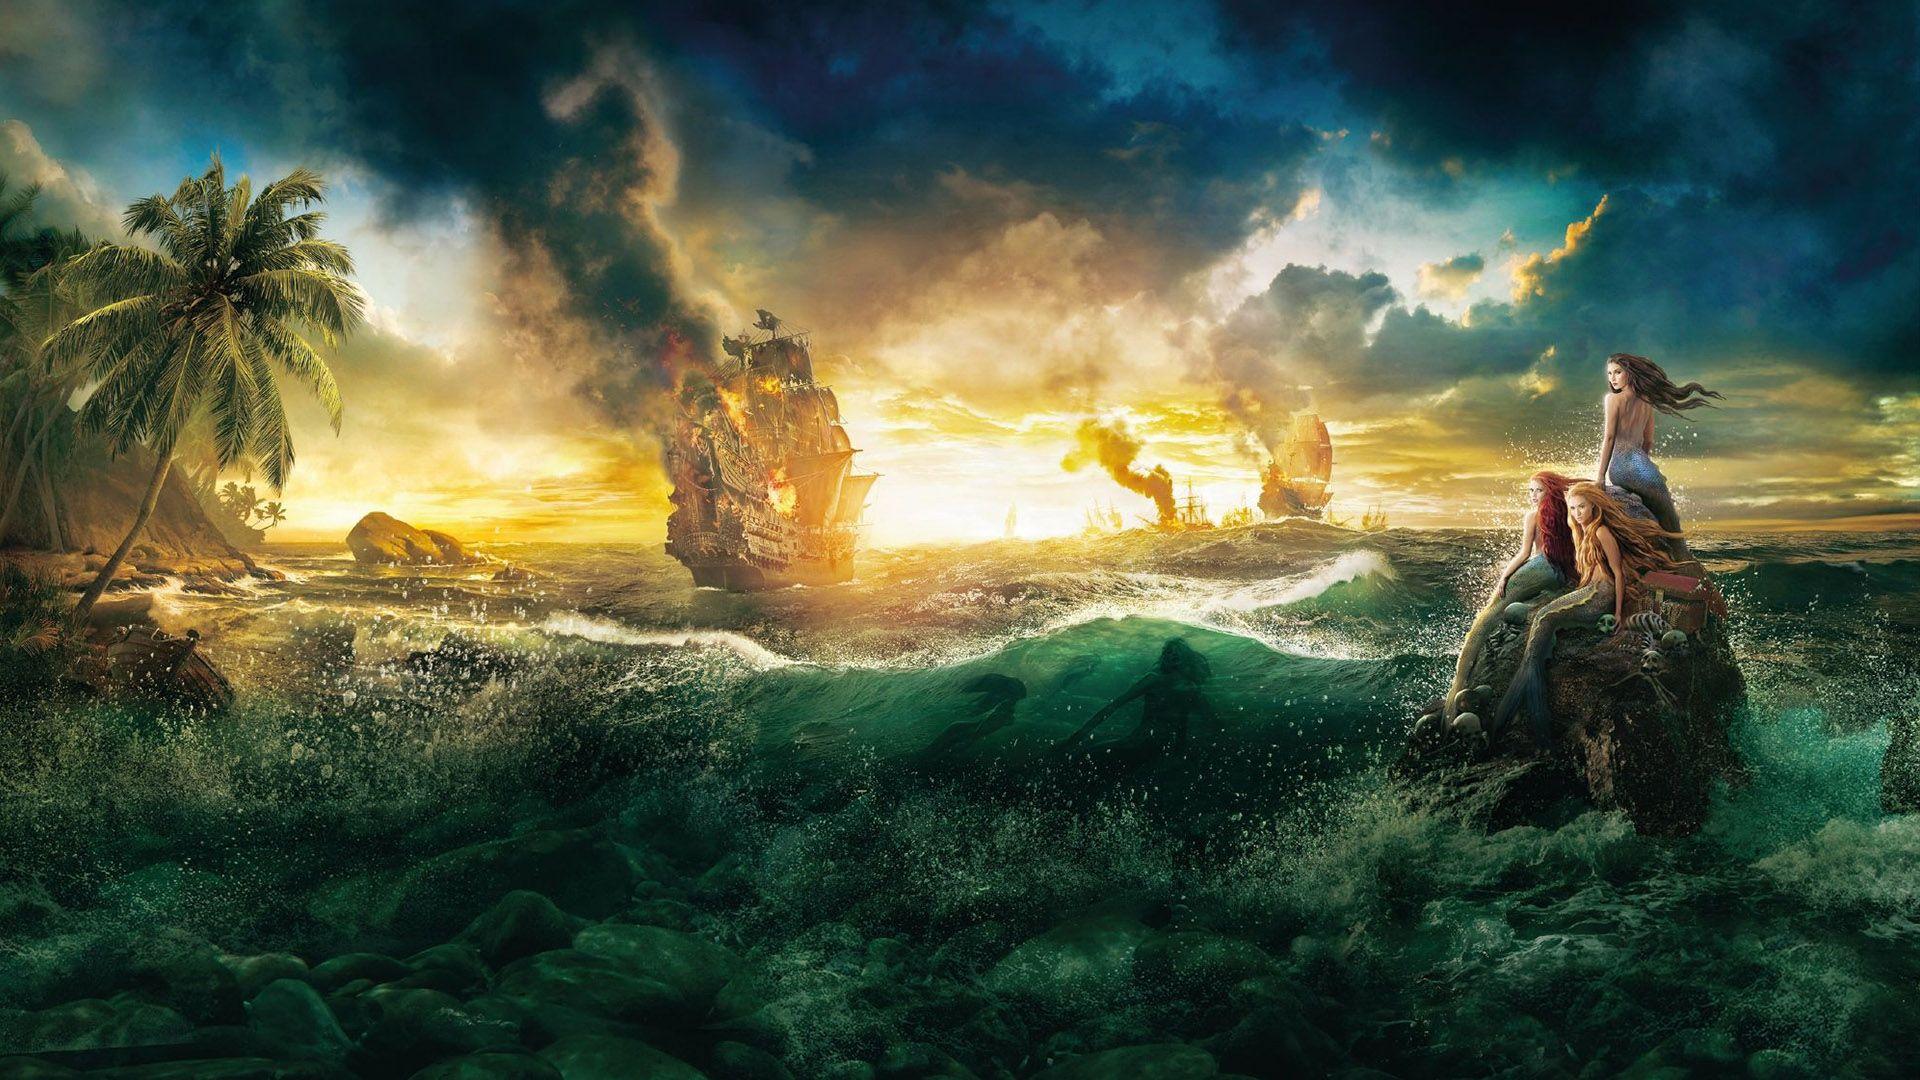 Pirates Of The Caribbean On Stranger Tides Mermaid Wallpaper